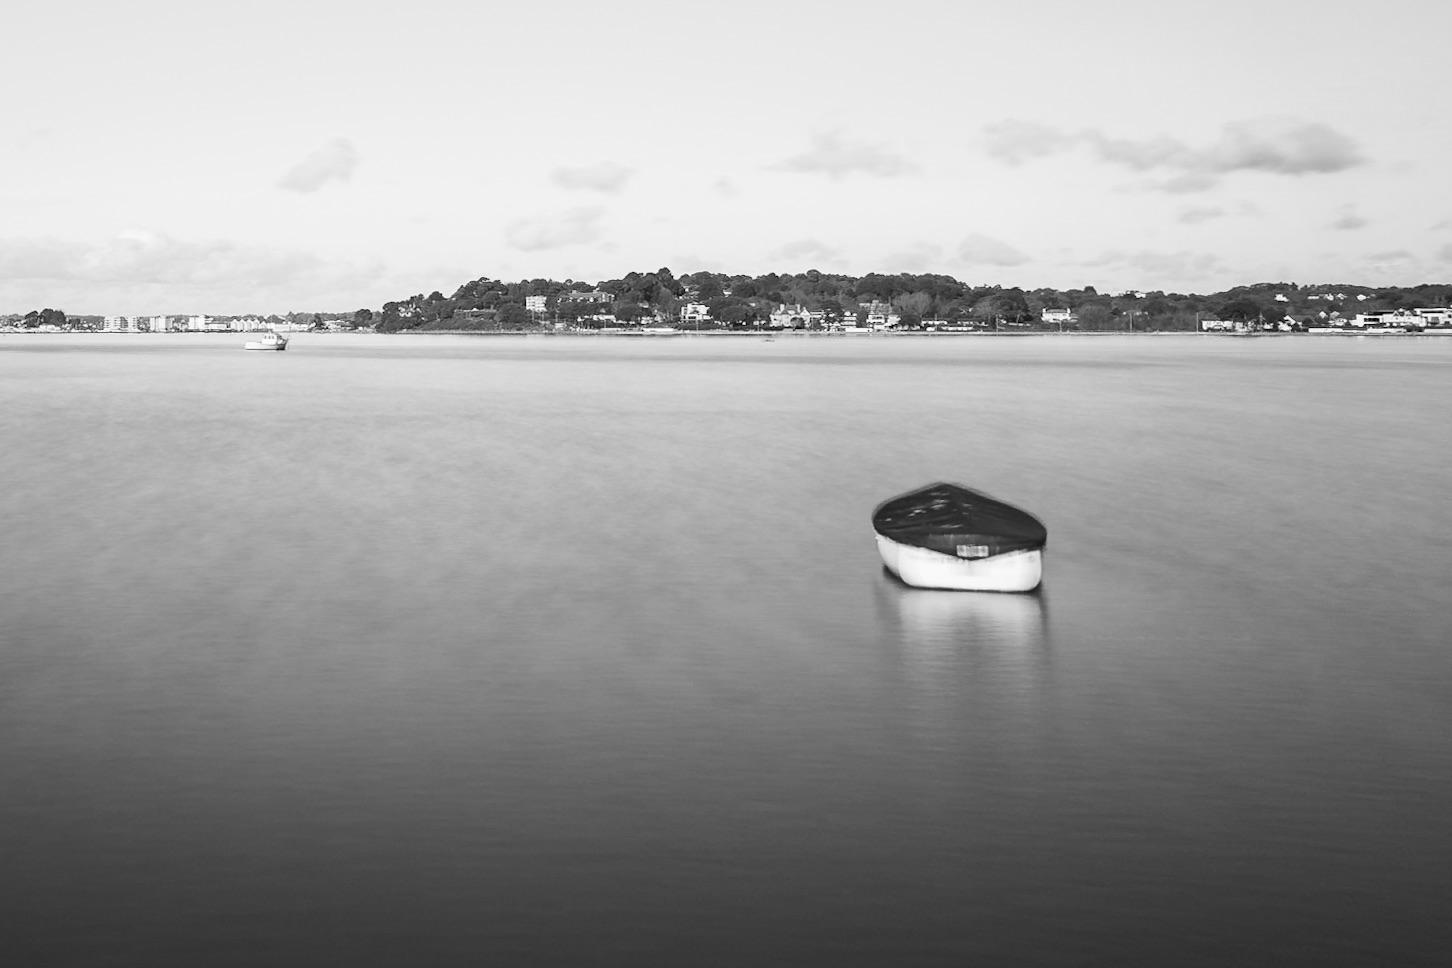 Black and white picture of a boat, Sandbanks, Dorset